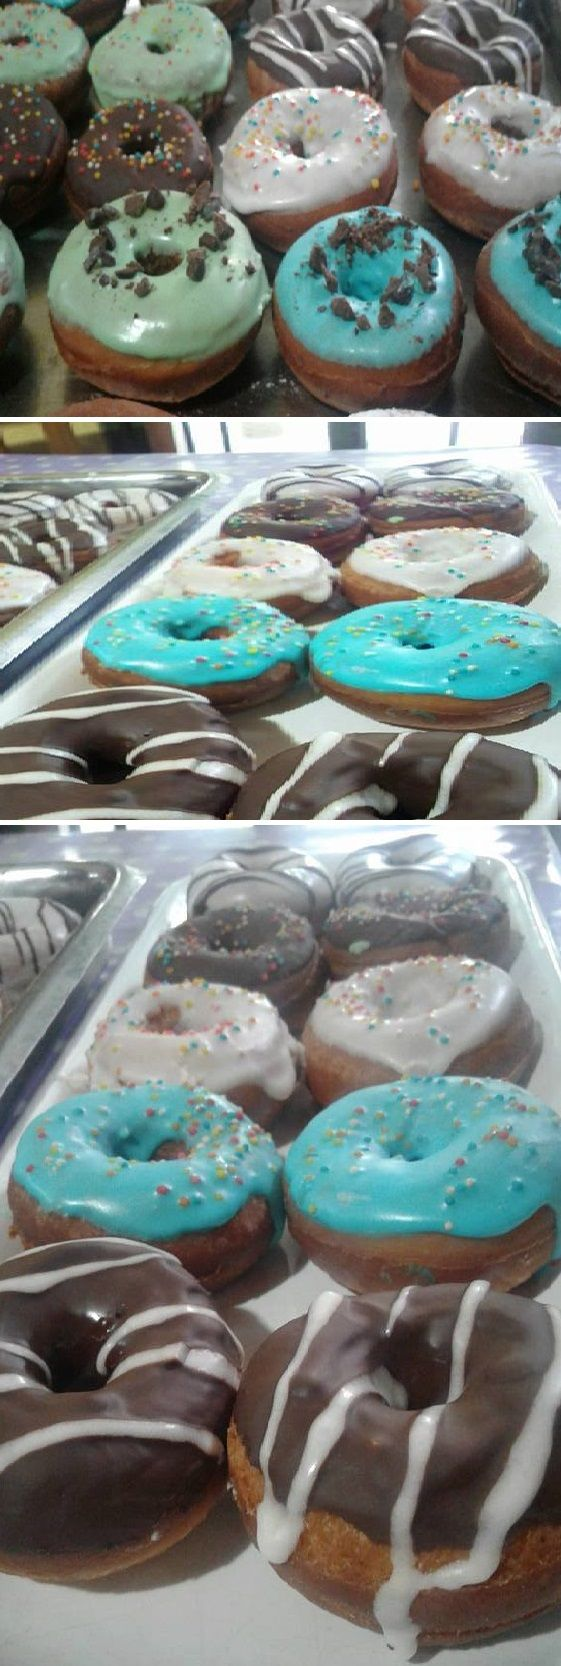 LAS MEJORES DONAS DEL MUNDO...  #mate #fraile #donas #caseras #receta #recipe #casero #torta #tartas #pastel #nestlecocina #bizcocho #bizcochuelo #tasty #cocina #chocolate #queso Si te gusta dinos HOLA y dale a Me Gusta MIREN …